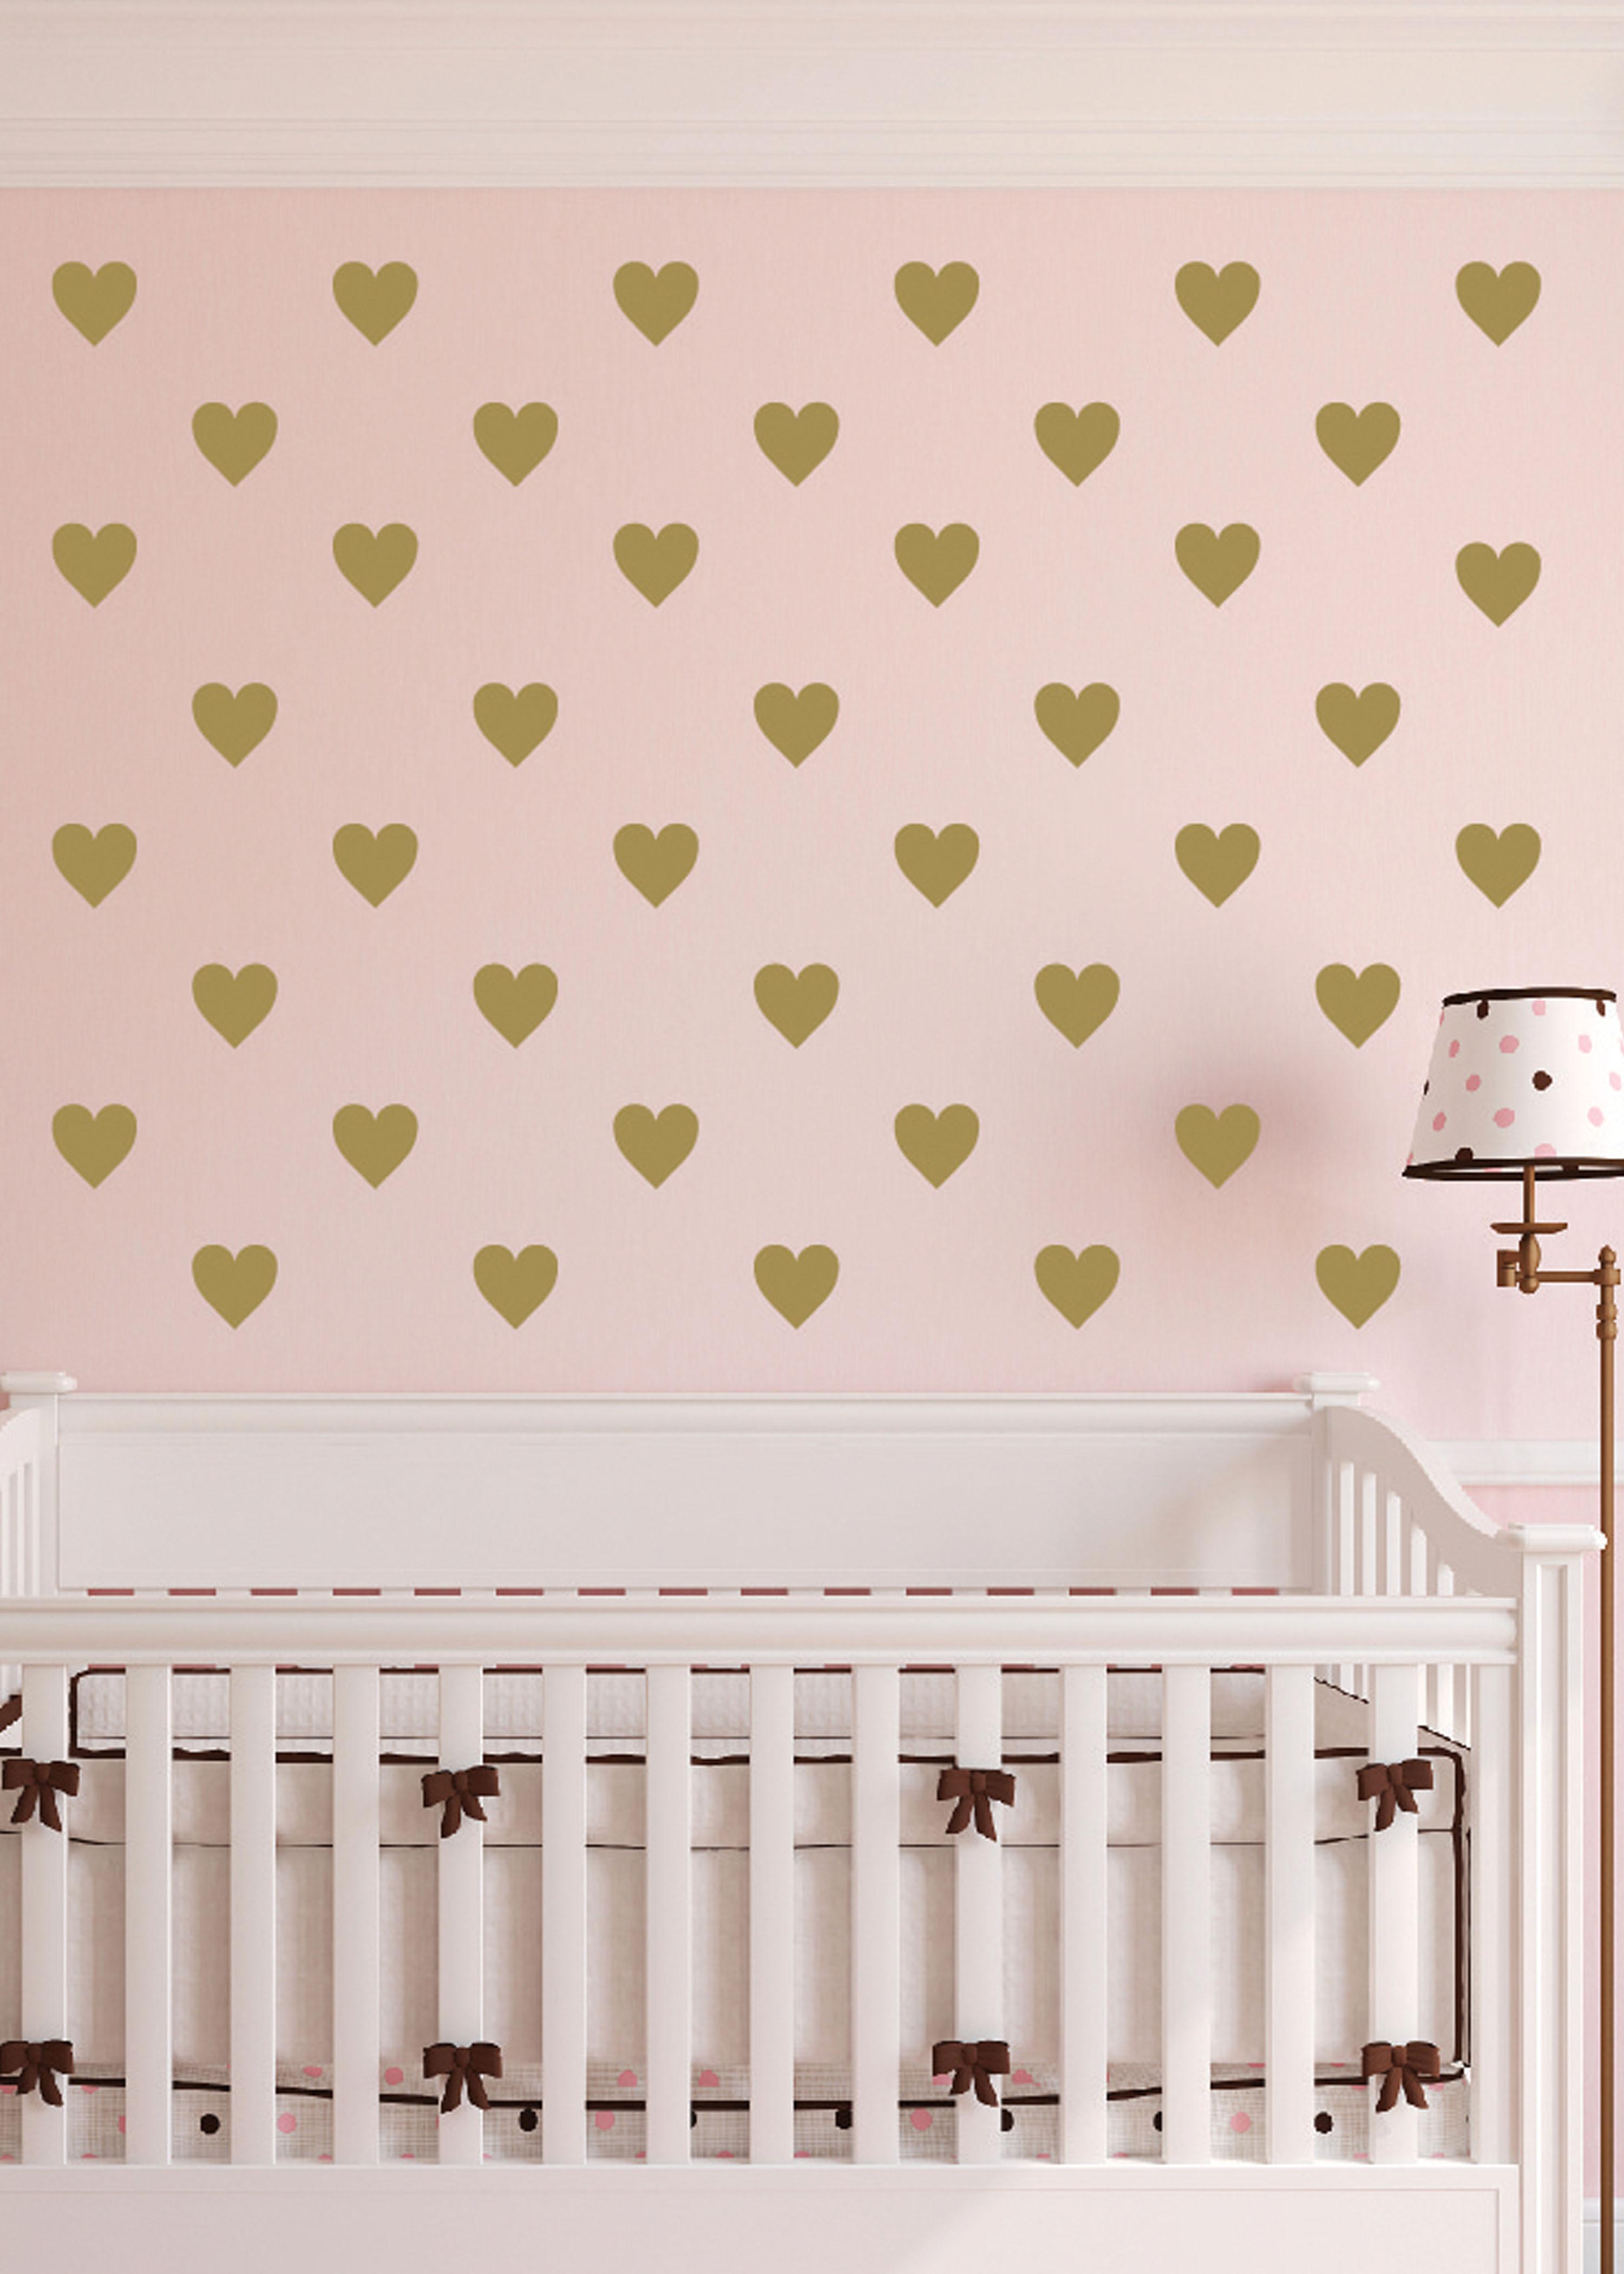 Polka dot hearts vinyl wall decal nursery toddler room geometric polka dot hearts vinyl wall decal nursery toddler room geometric wall pattern gold diy confetti poka dots amipublicfo Images